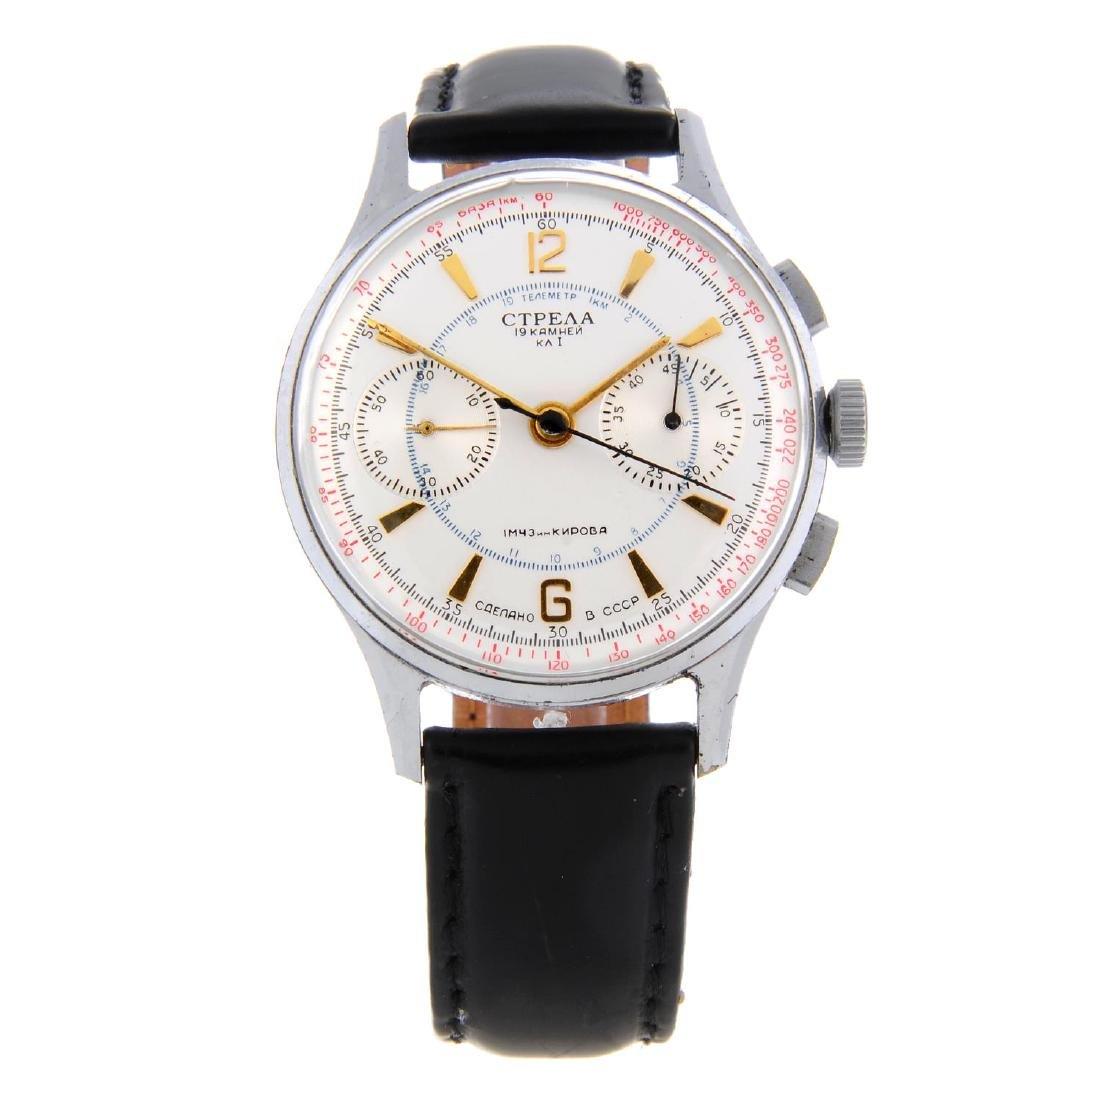 STRELA - a gentleman's chronograph wrist watch. Nickel